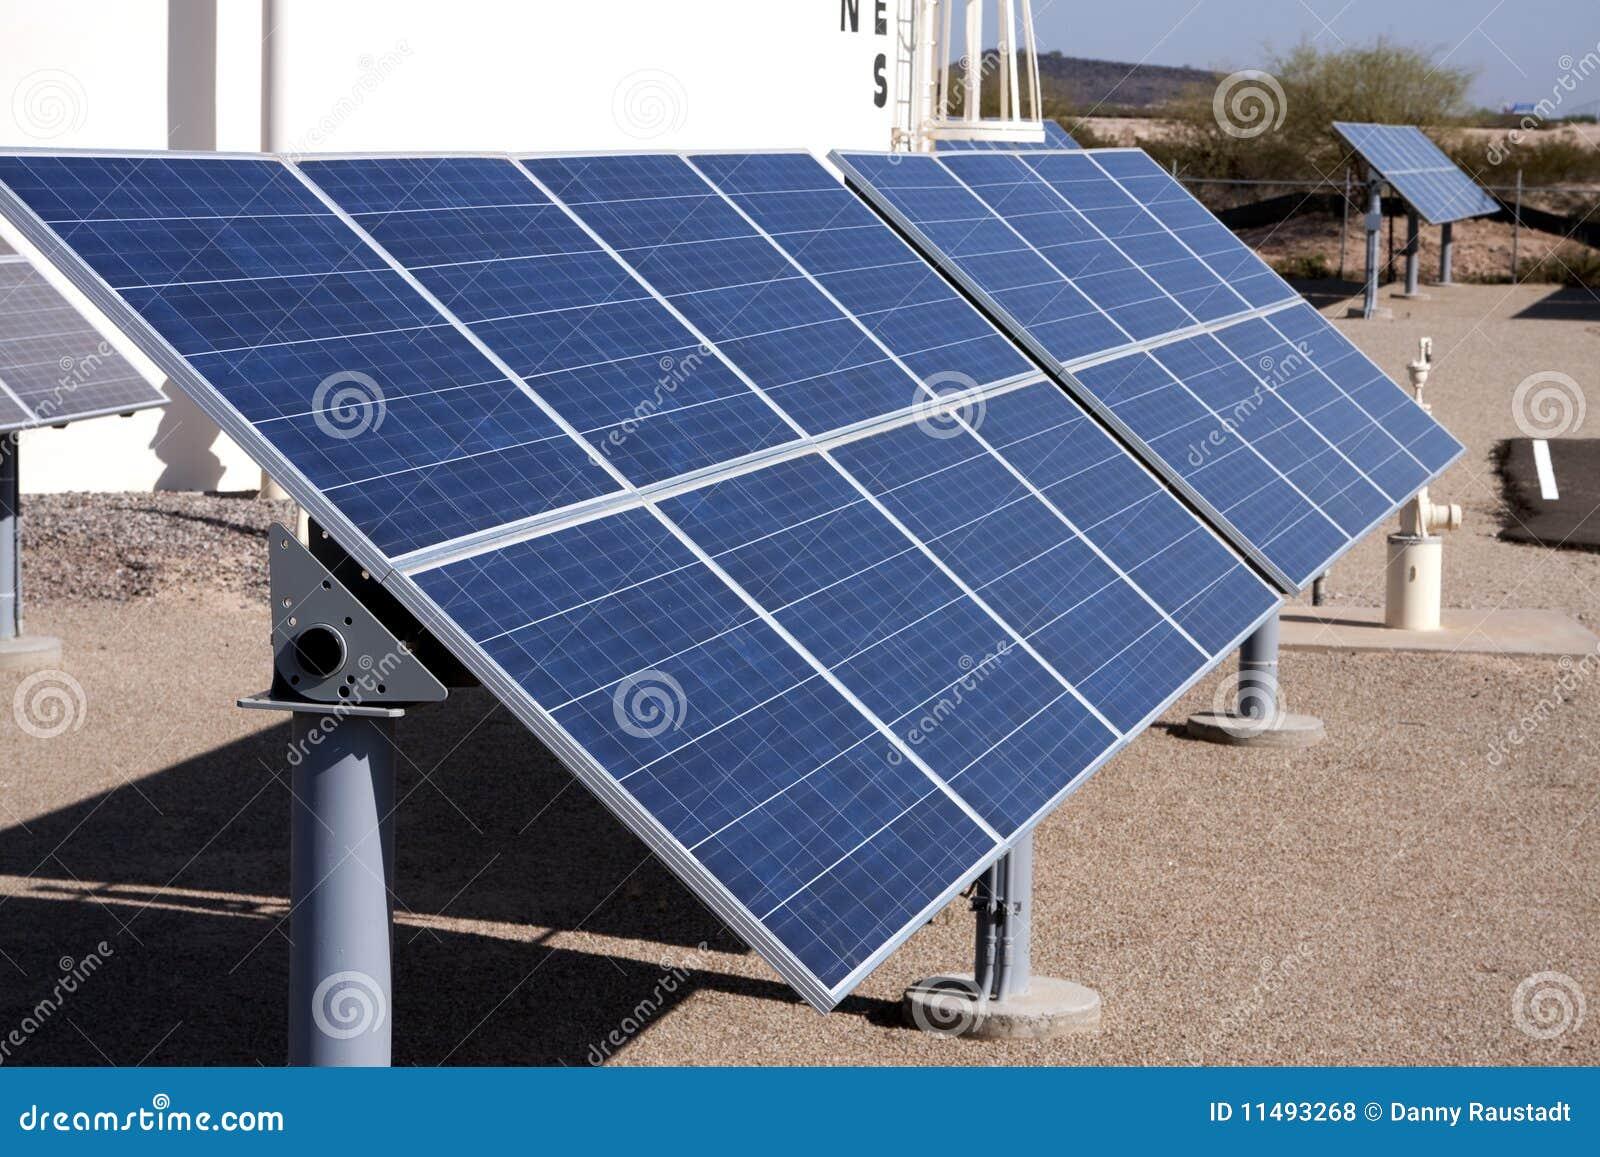 Solar Panel Energy Collector Farm Royalty Free Stock